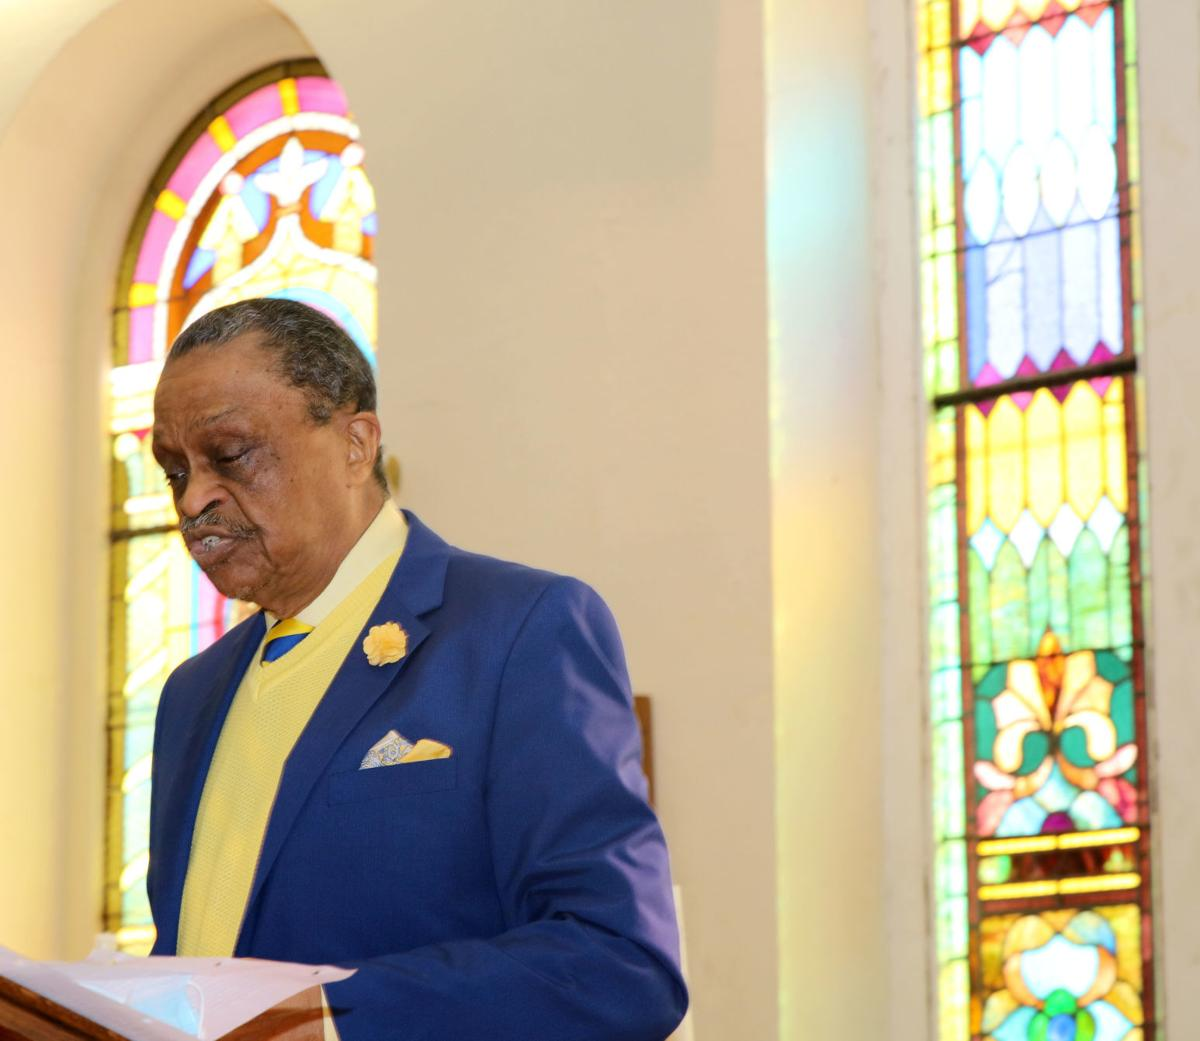 Rev. Robert Collier Sr.